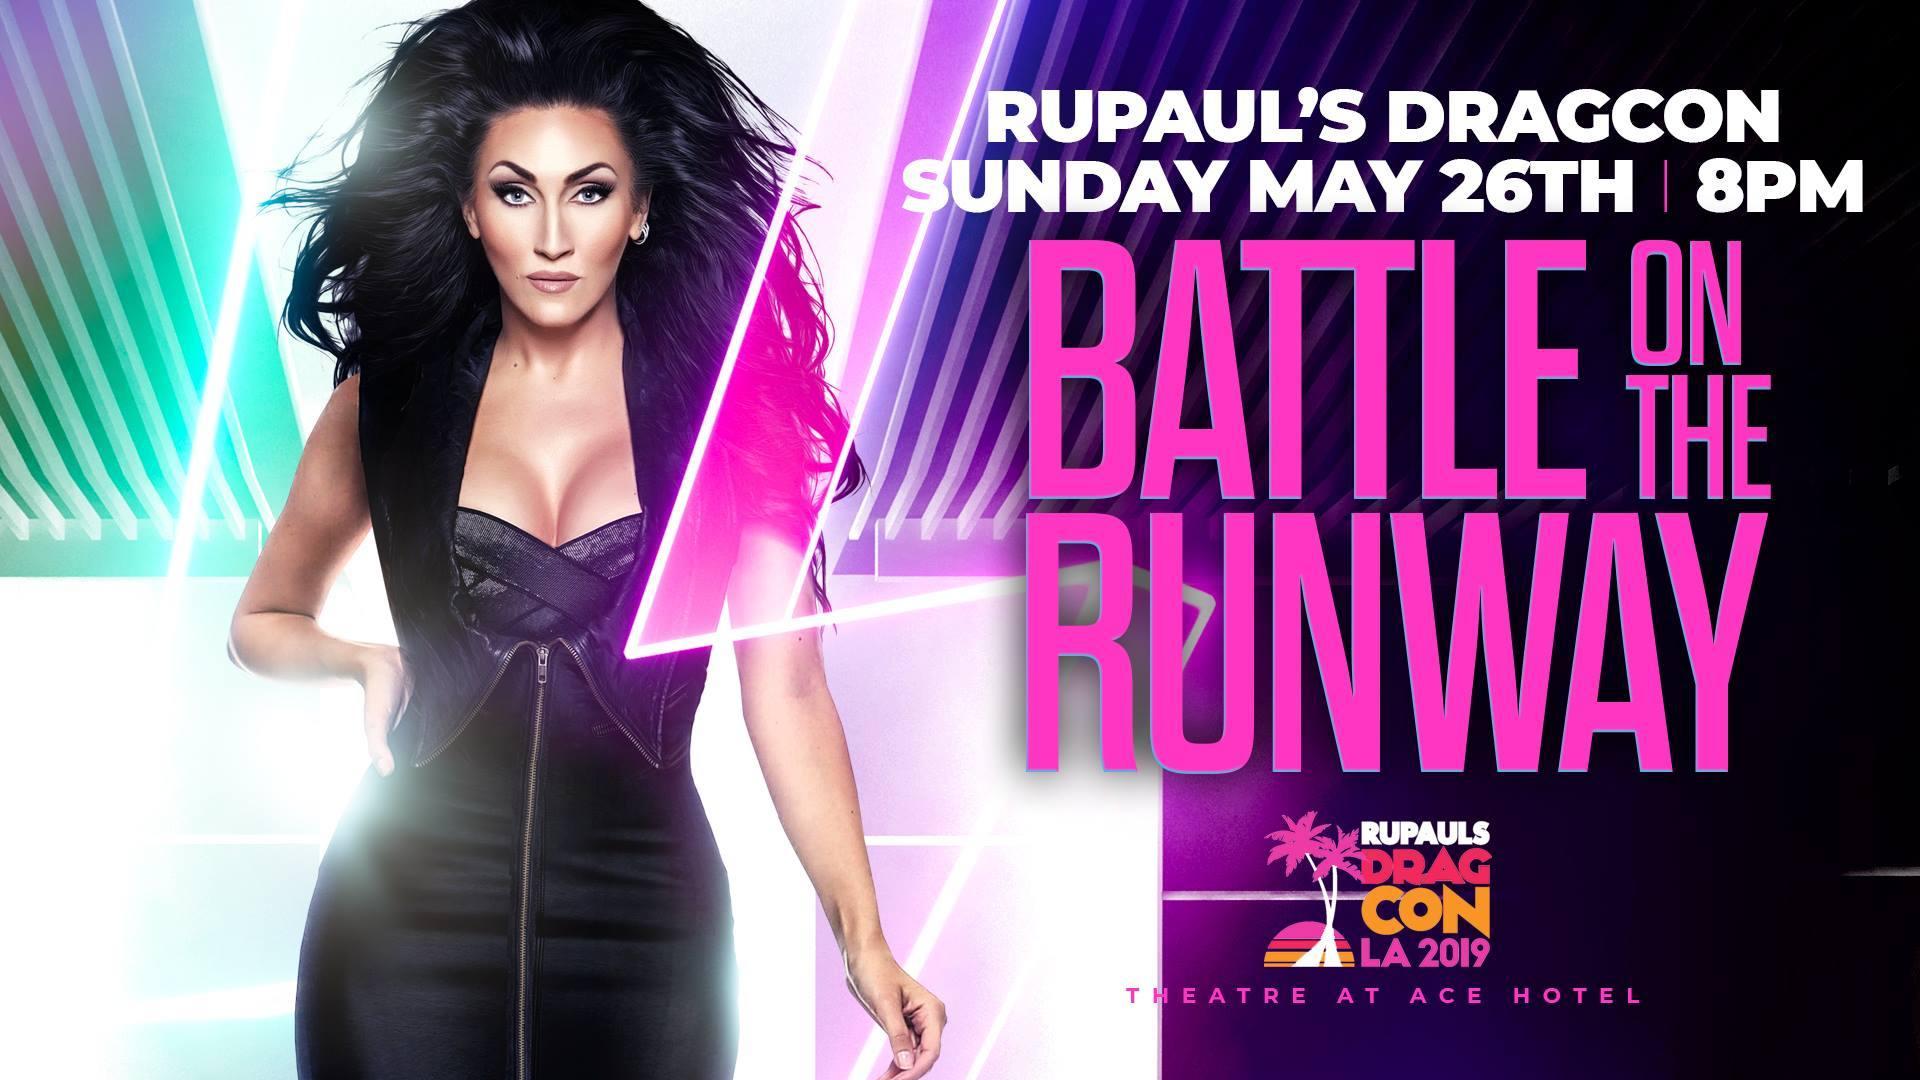 RuPaul's DragCon Battle on the Runway 2019